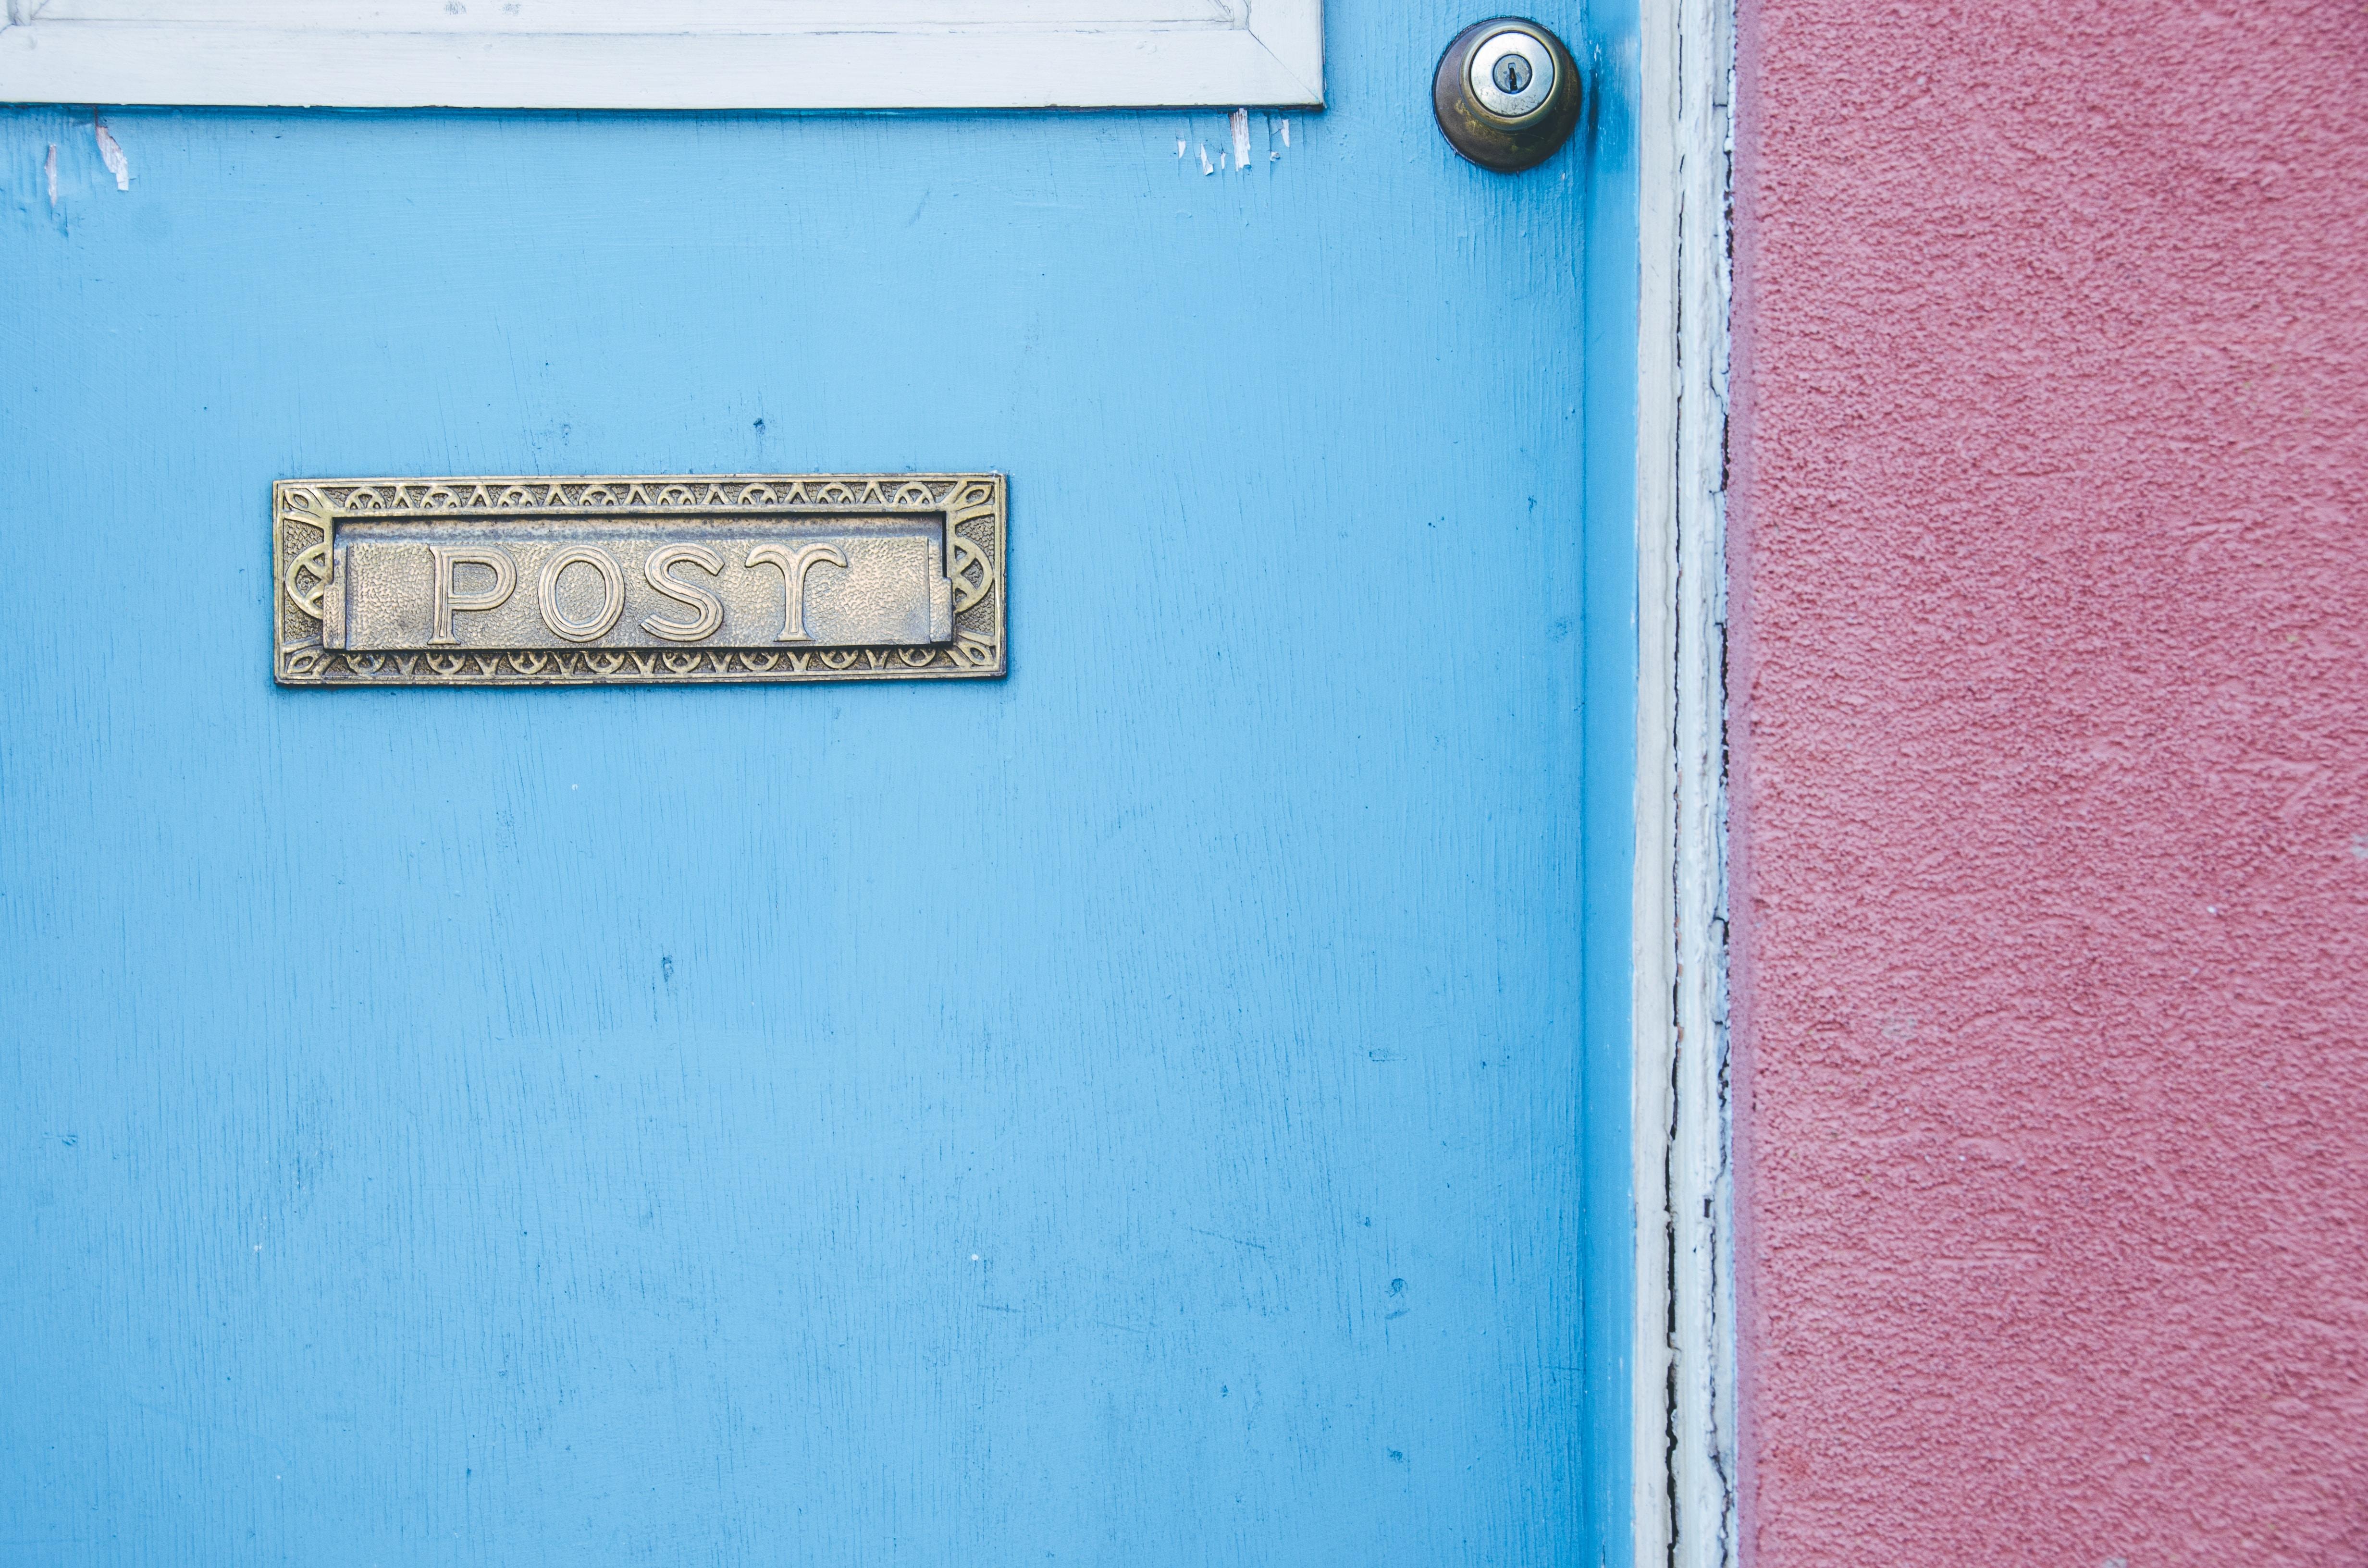 gray post signage on blue wooden door